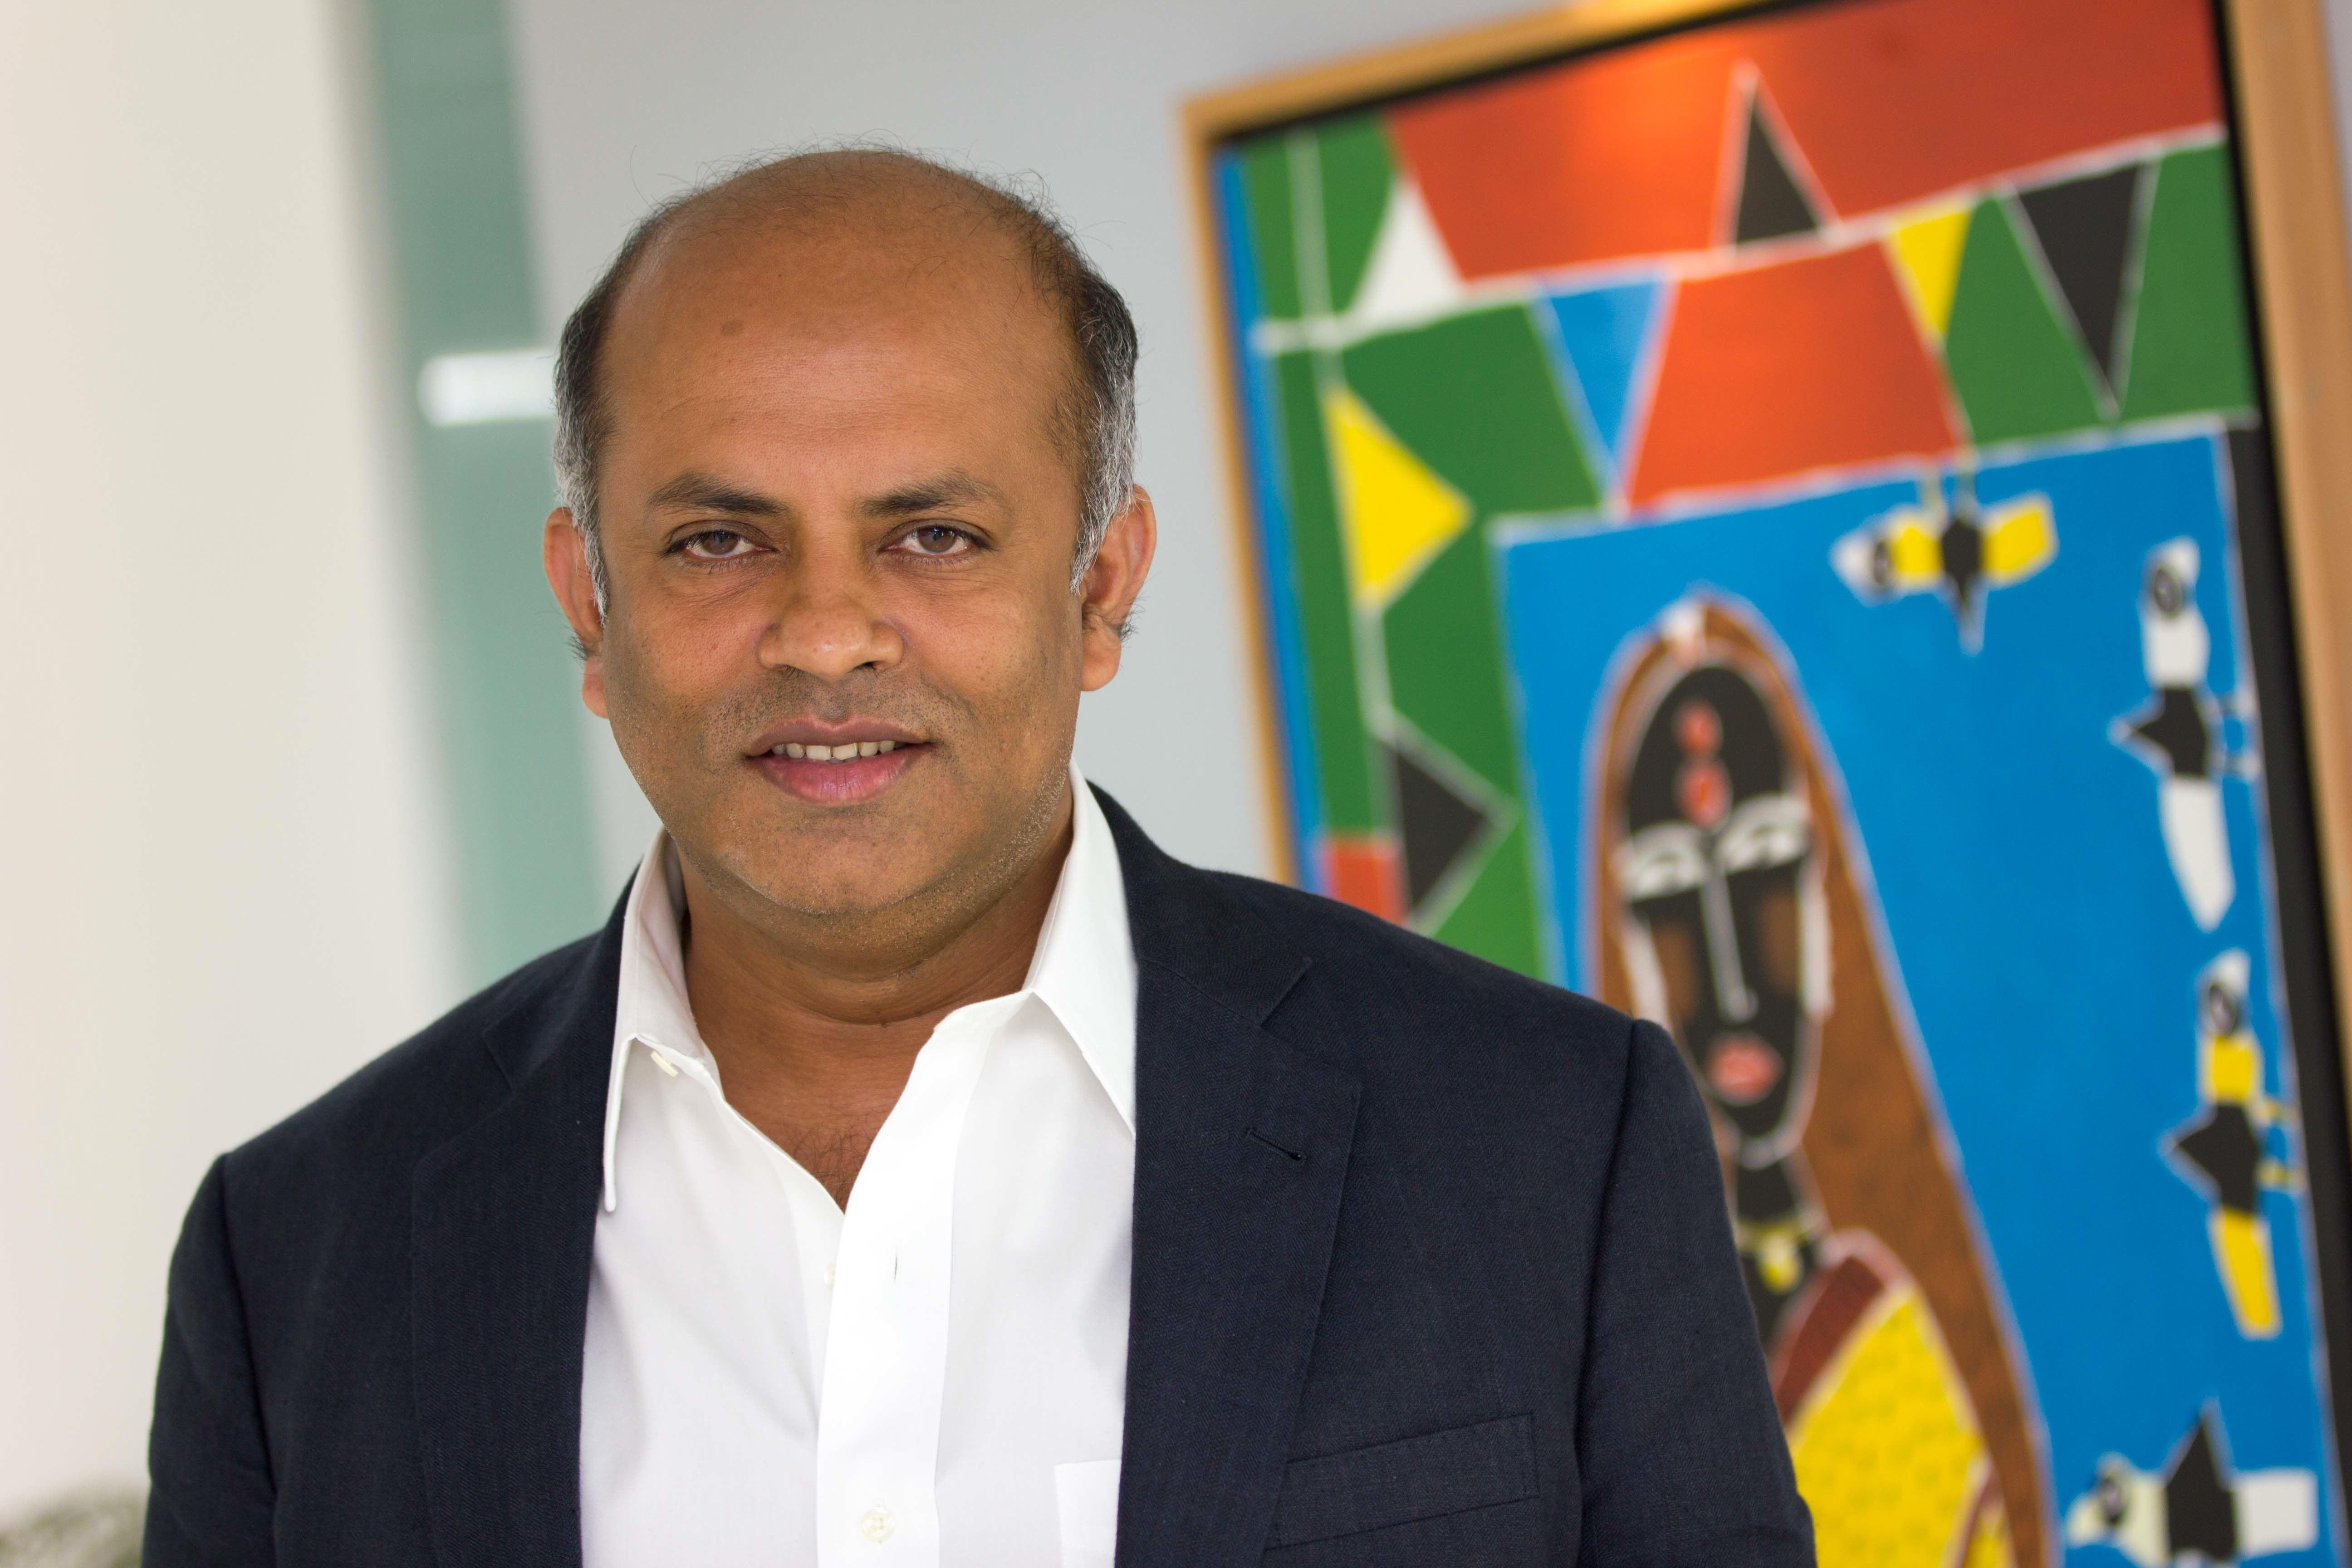 Bangladesh's Good News With Khalid Quadir Of Brummer & Partners